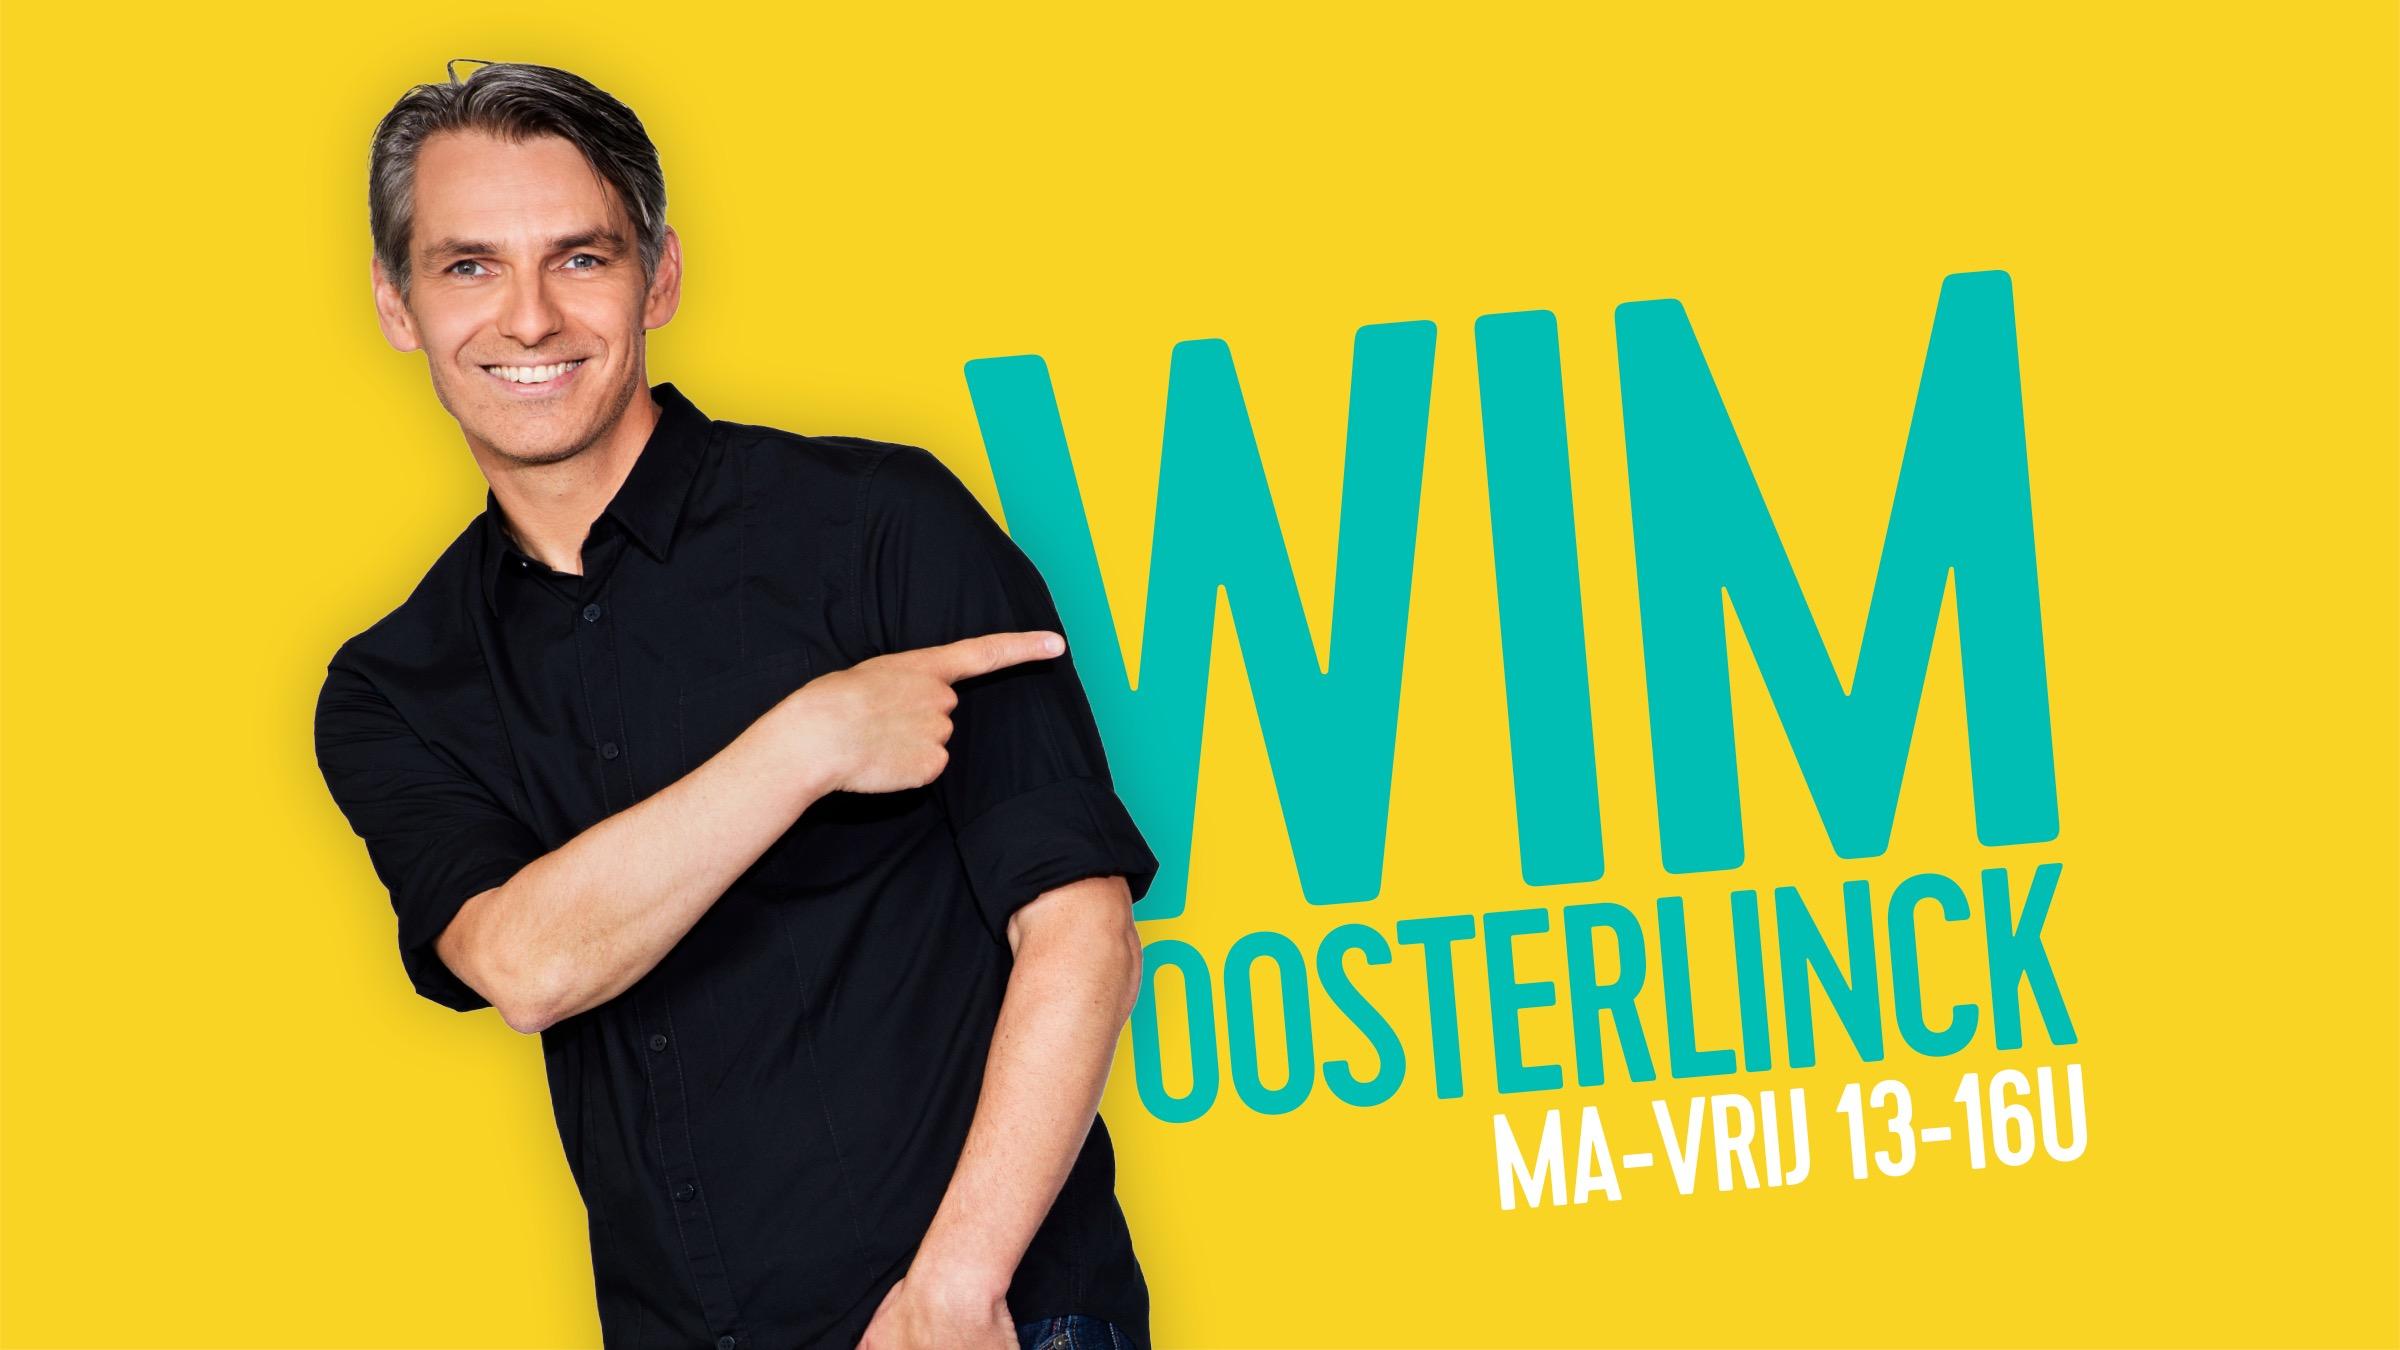 Wim oosterlinck